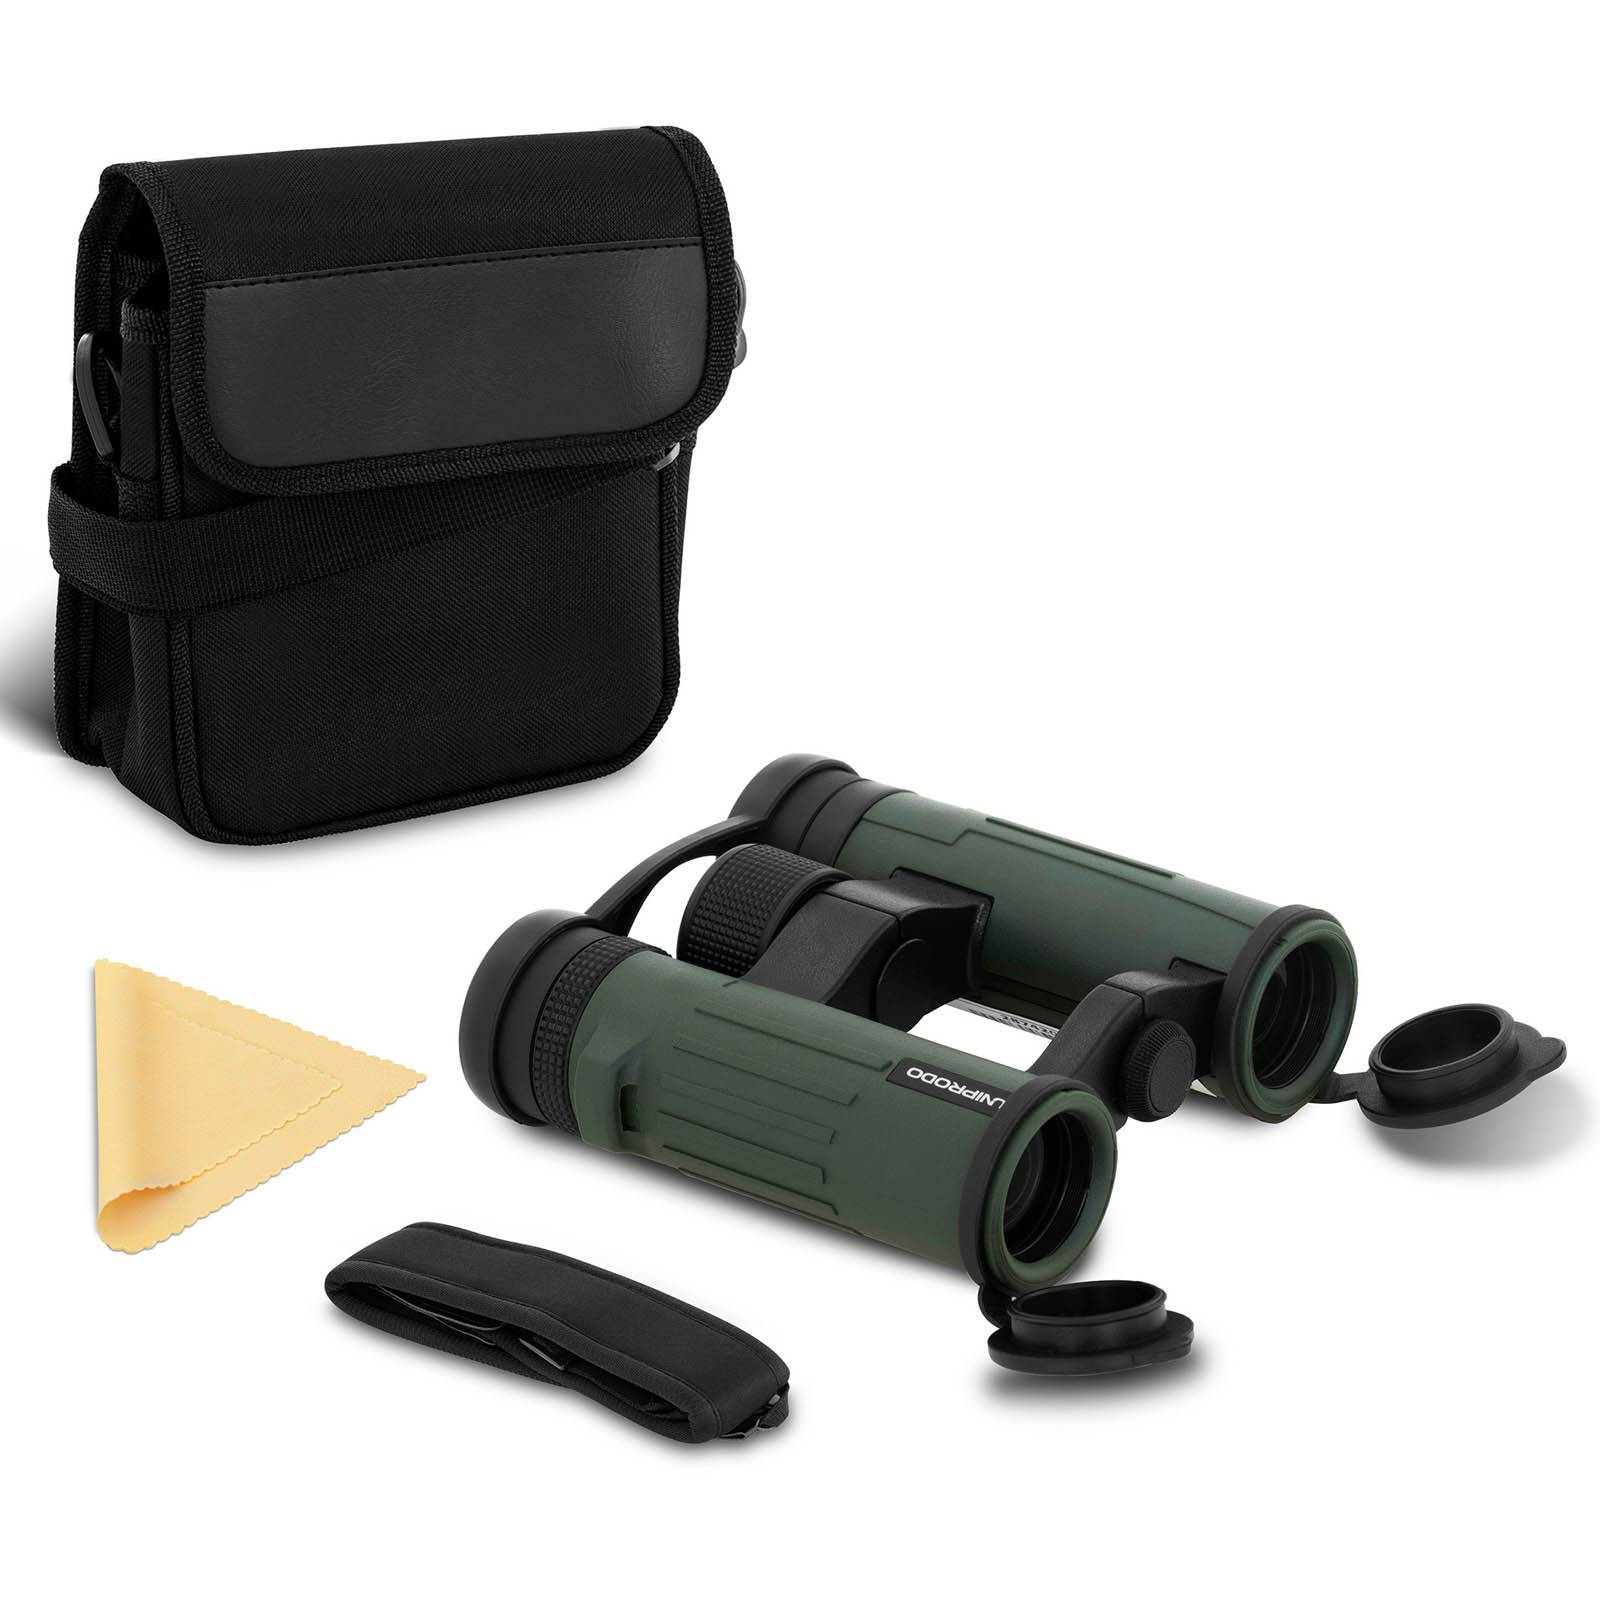 Uniprodo Binoculars - 10x26 - 7° - 98 m/1,000 m - BAK-4 roof prism UNI_BINOCULAR_04